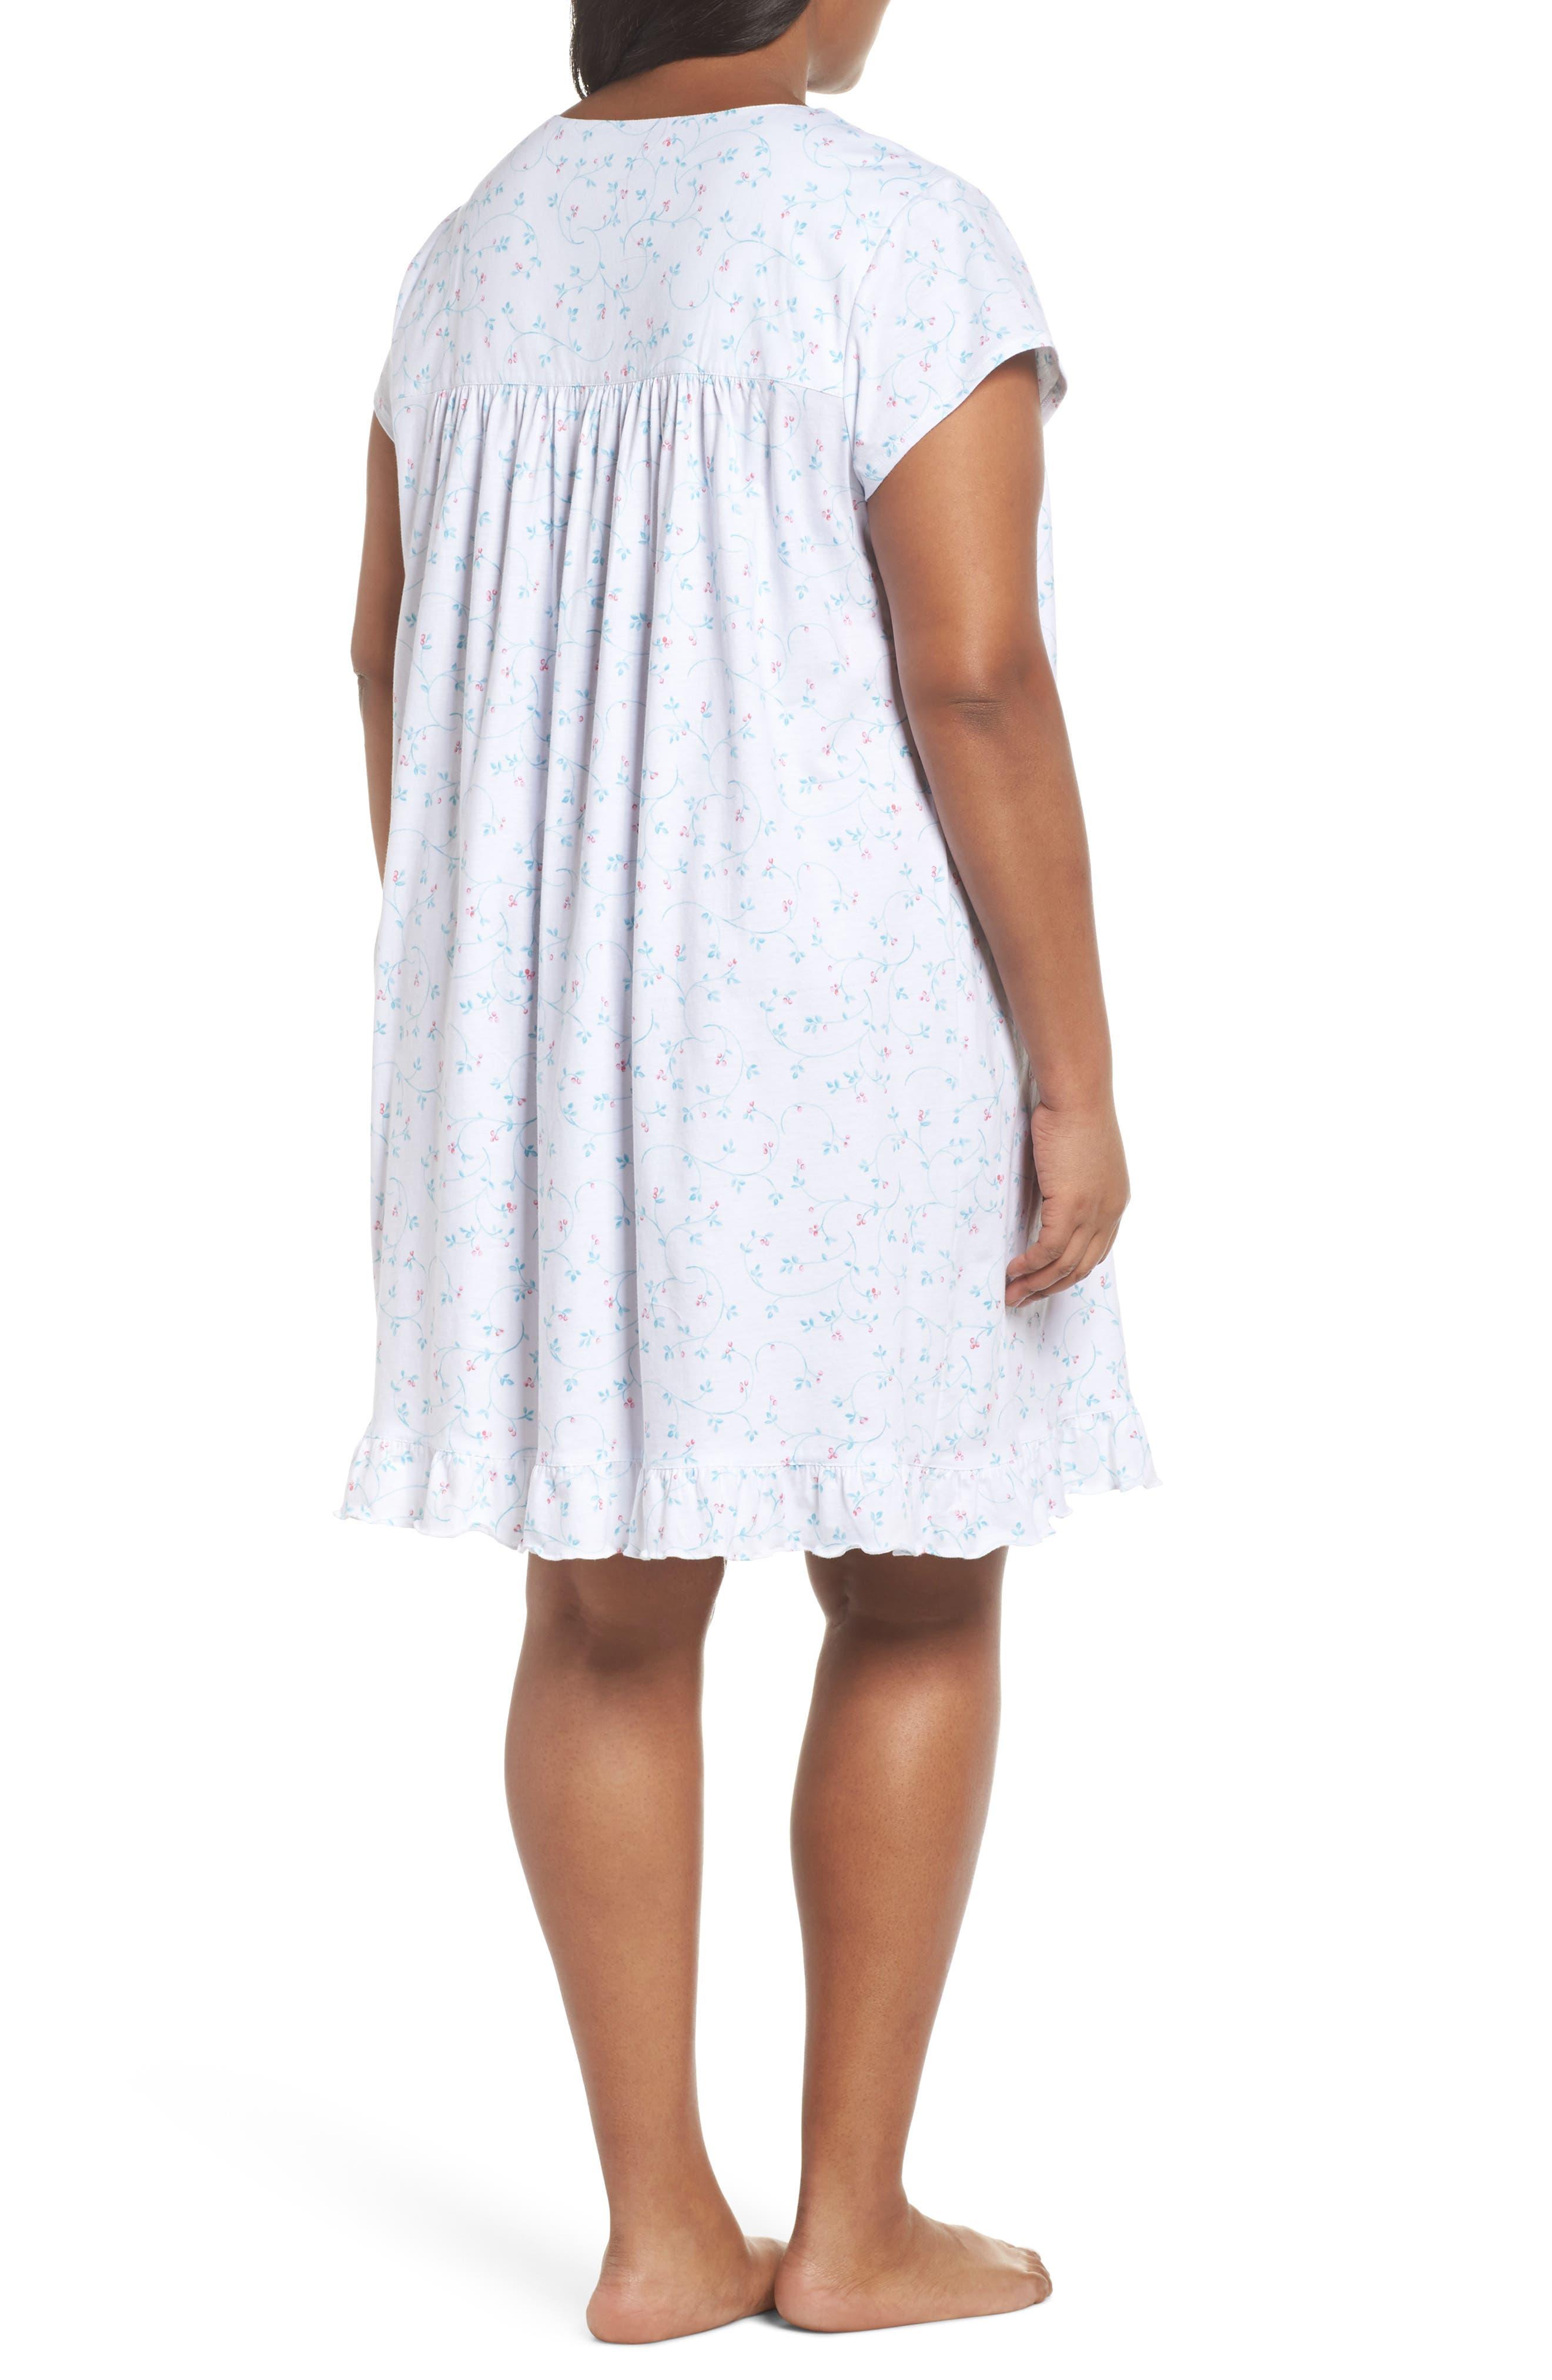 Cotton Jersey Short Nightgown,                             Alternate thumbnail 2, color,                             White Aqua/ Pink Berries